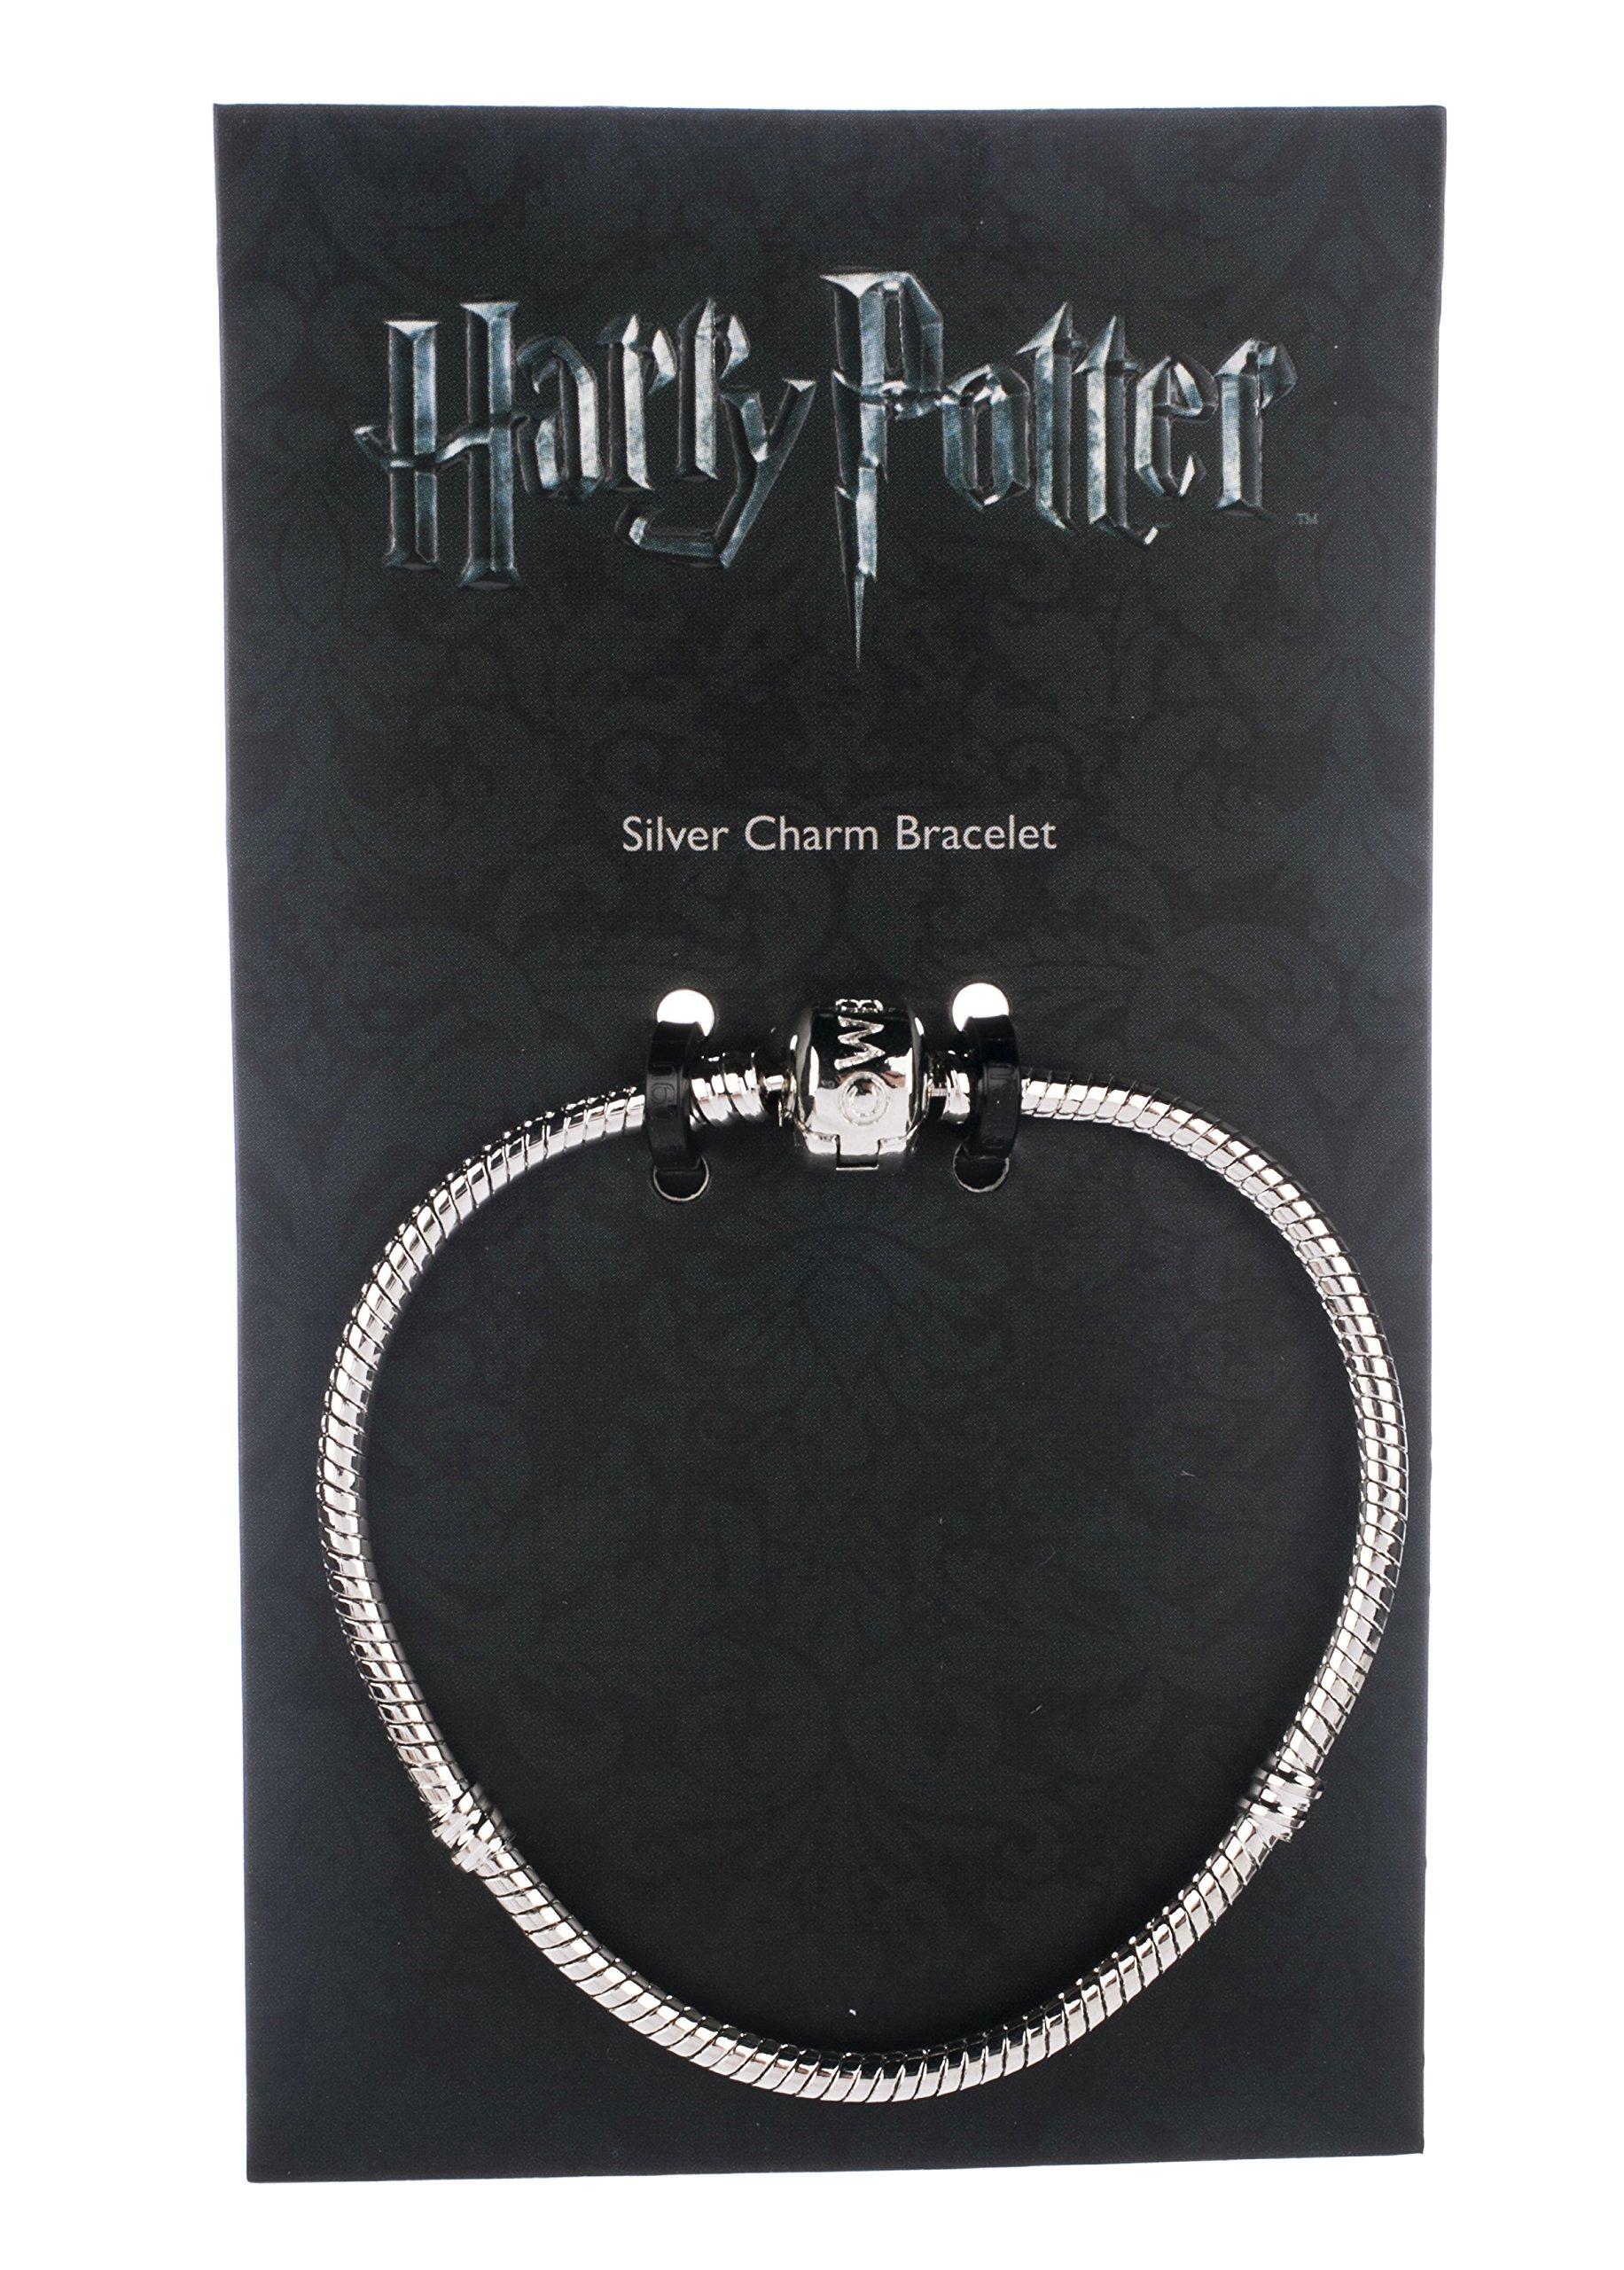 Harry Potter Slider Charm Braccialetto Bracelet (silver plated) Size M Carat Shop, The